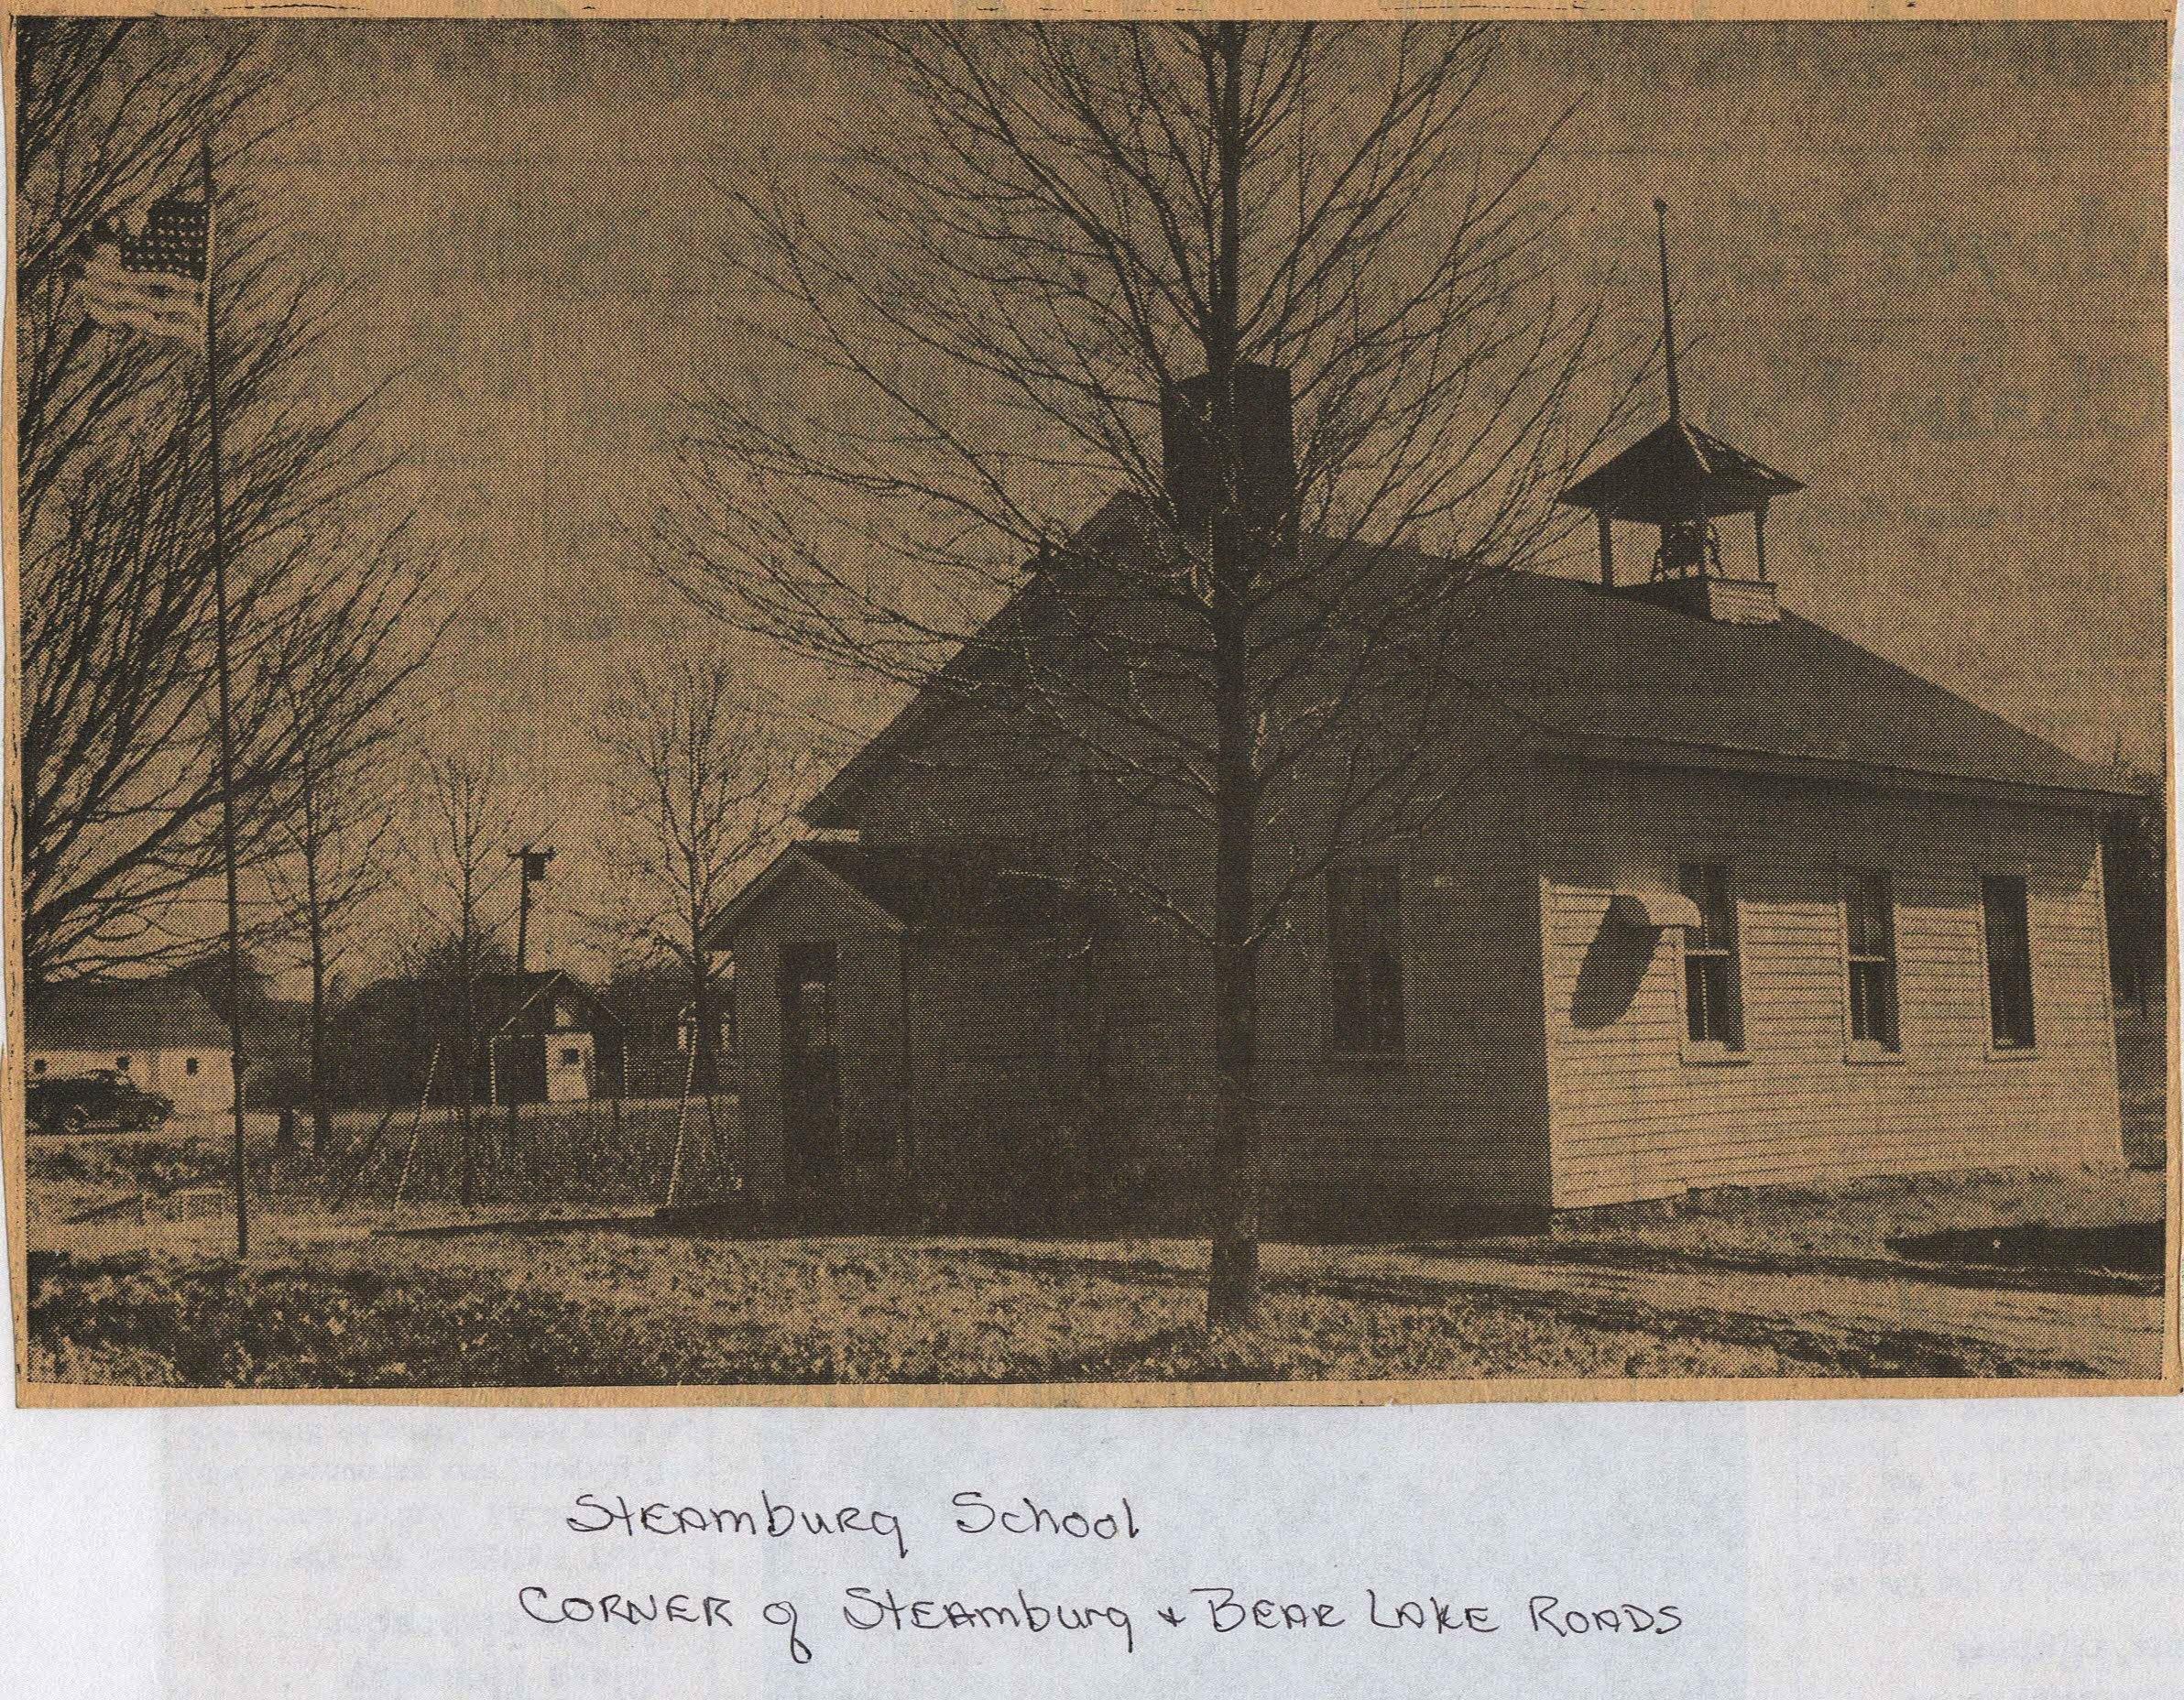 Steamburg School #2.jpeg